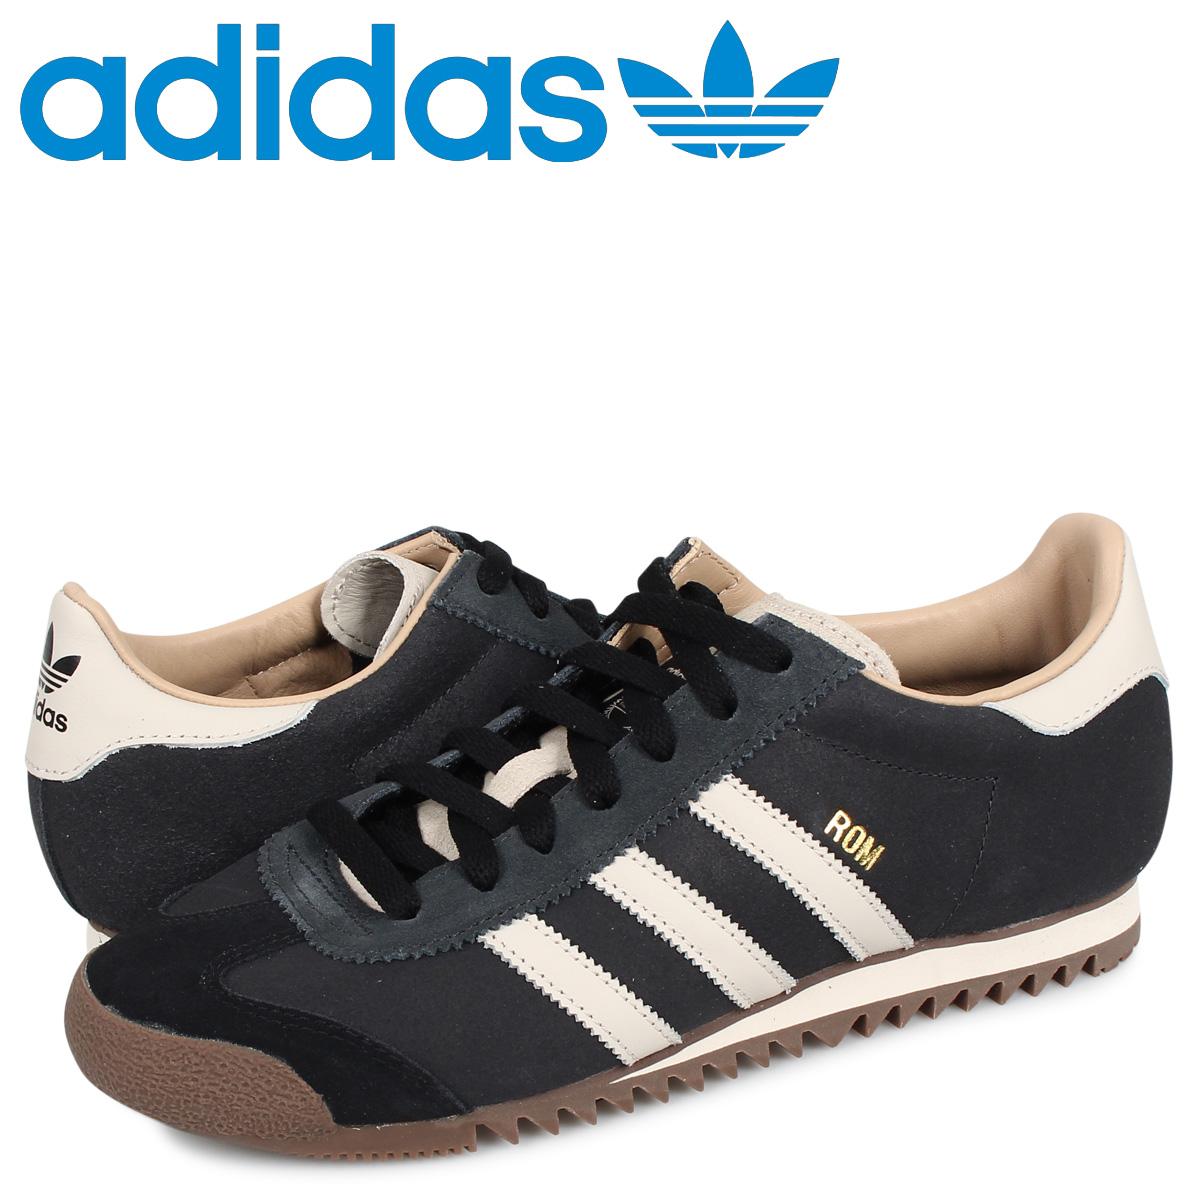 adidas Originals ROM Shoes (Carbon) EE5746